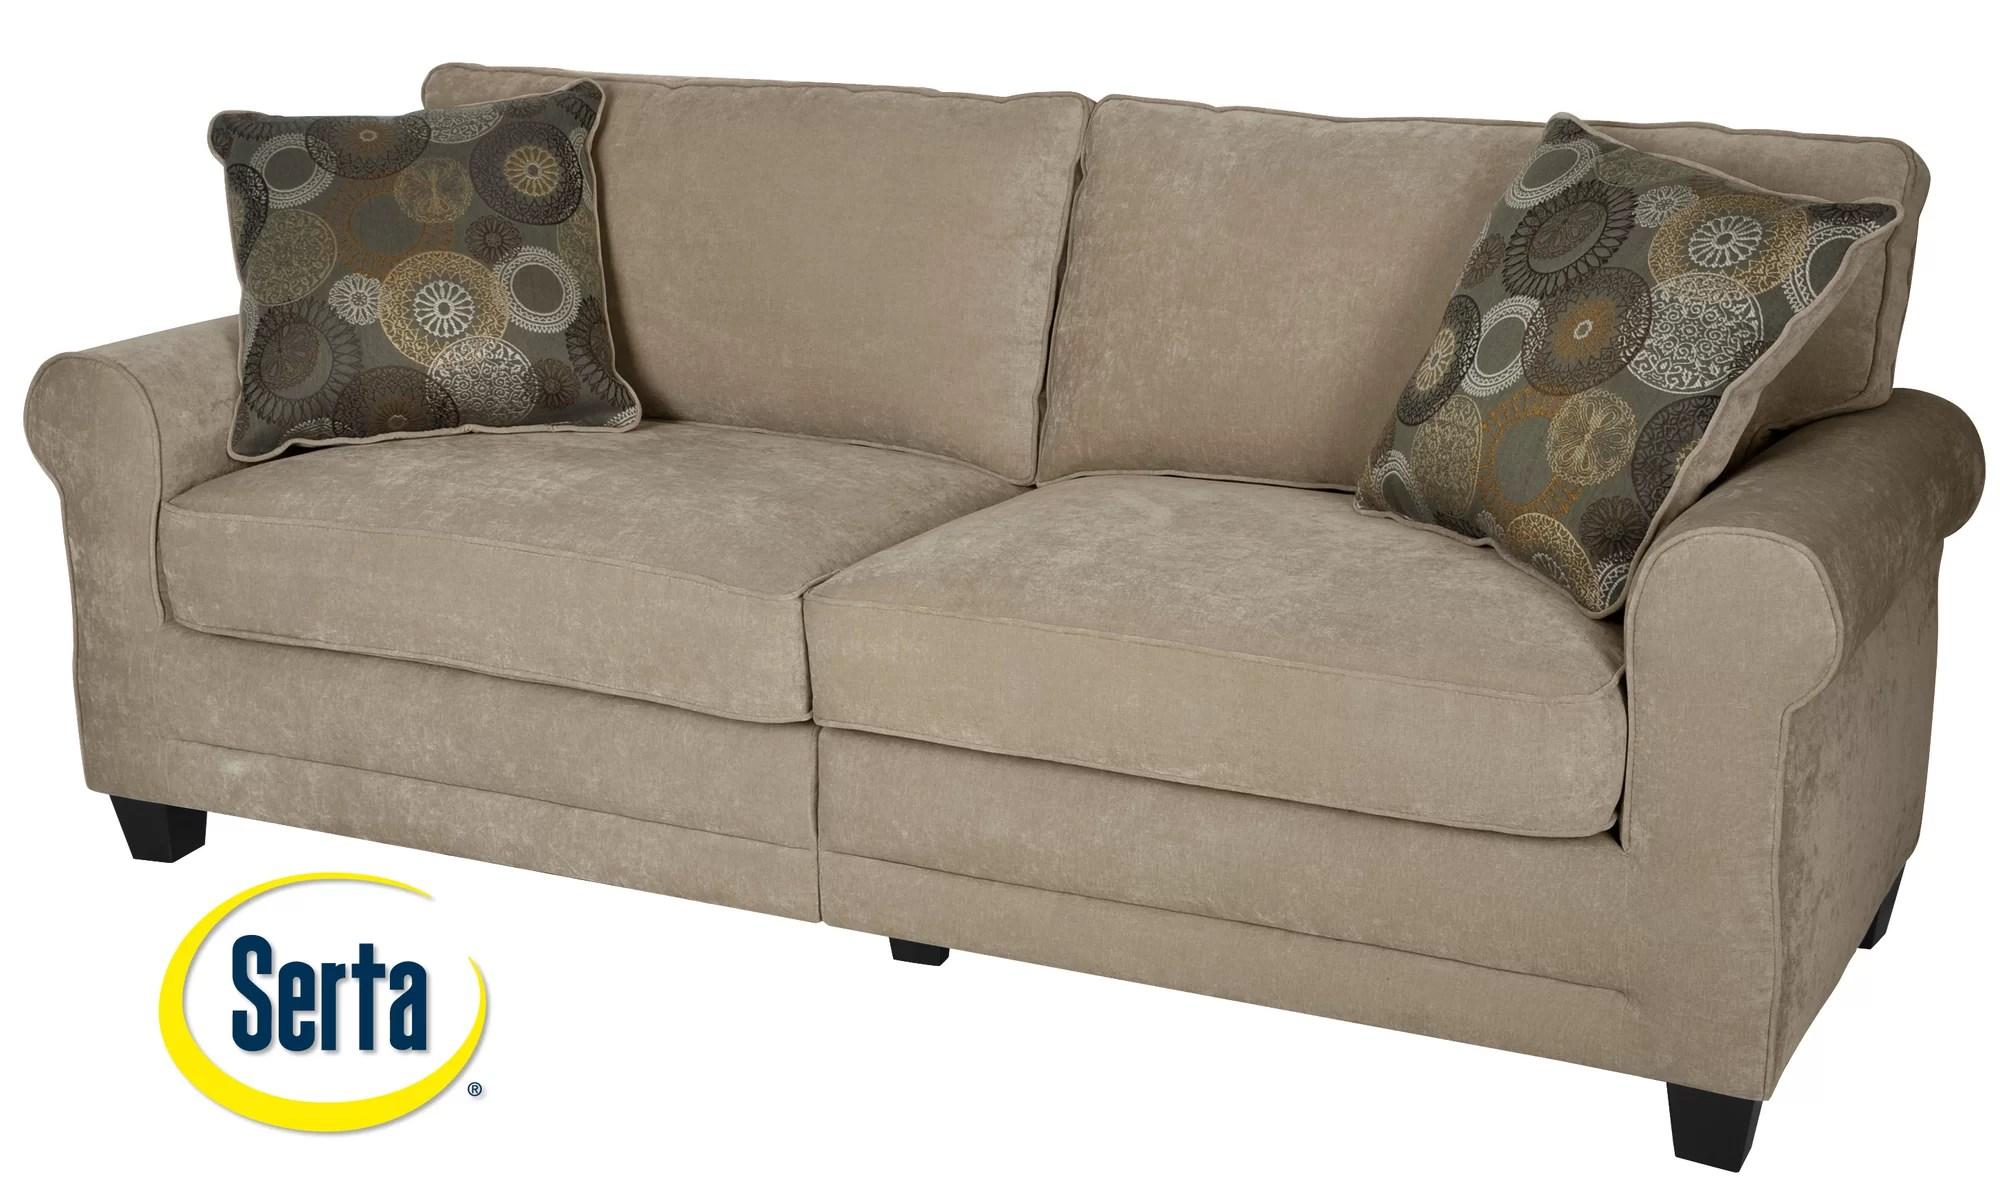 sleeper sofa bad credit memory foam reviews on no check furniture financing fair